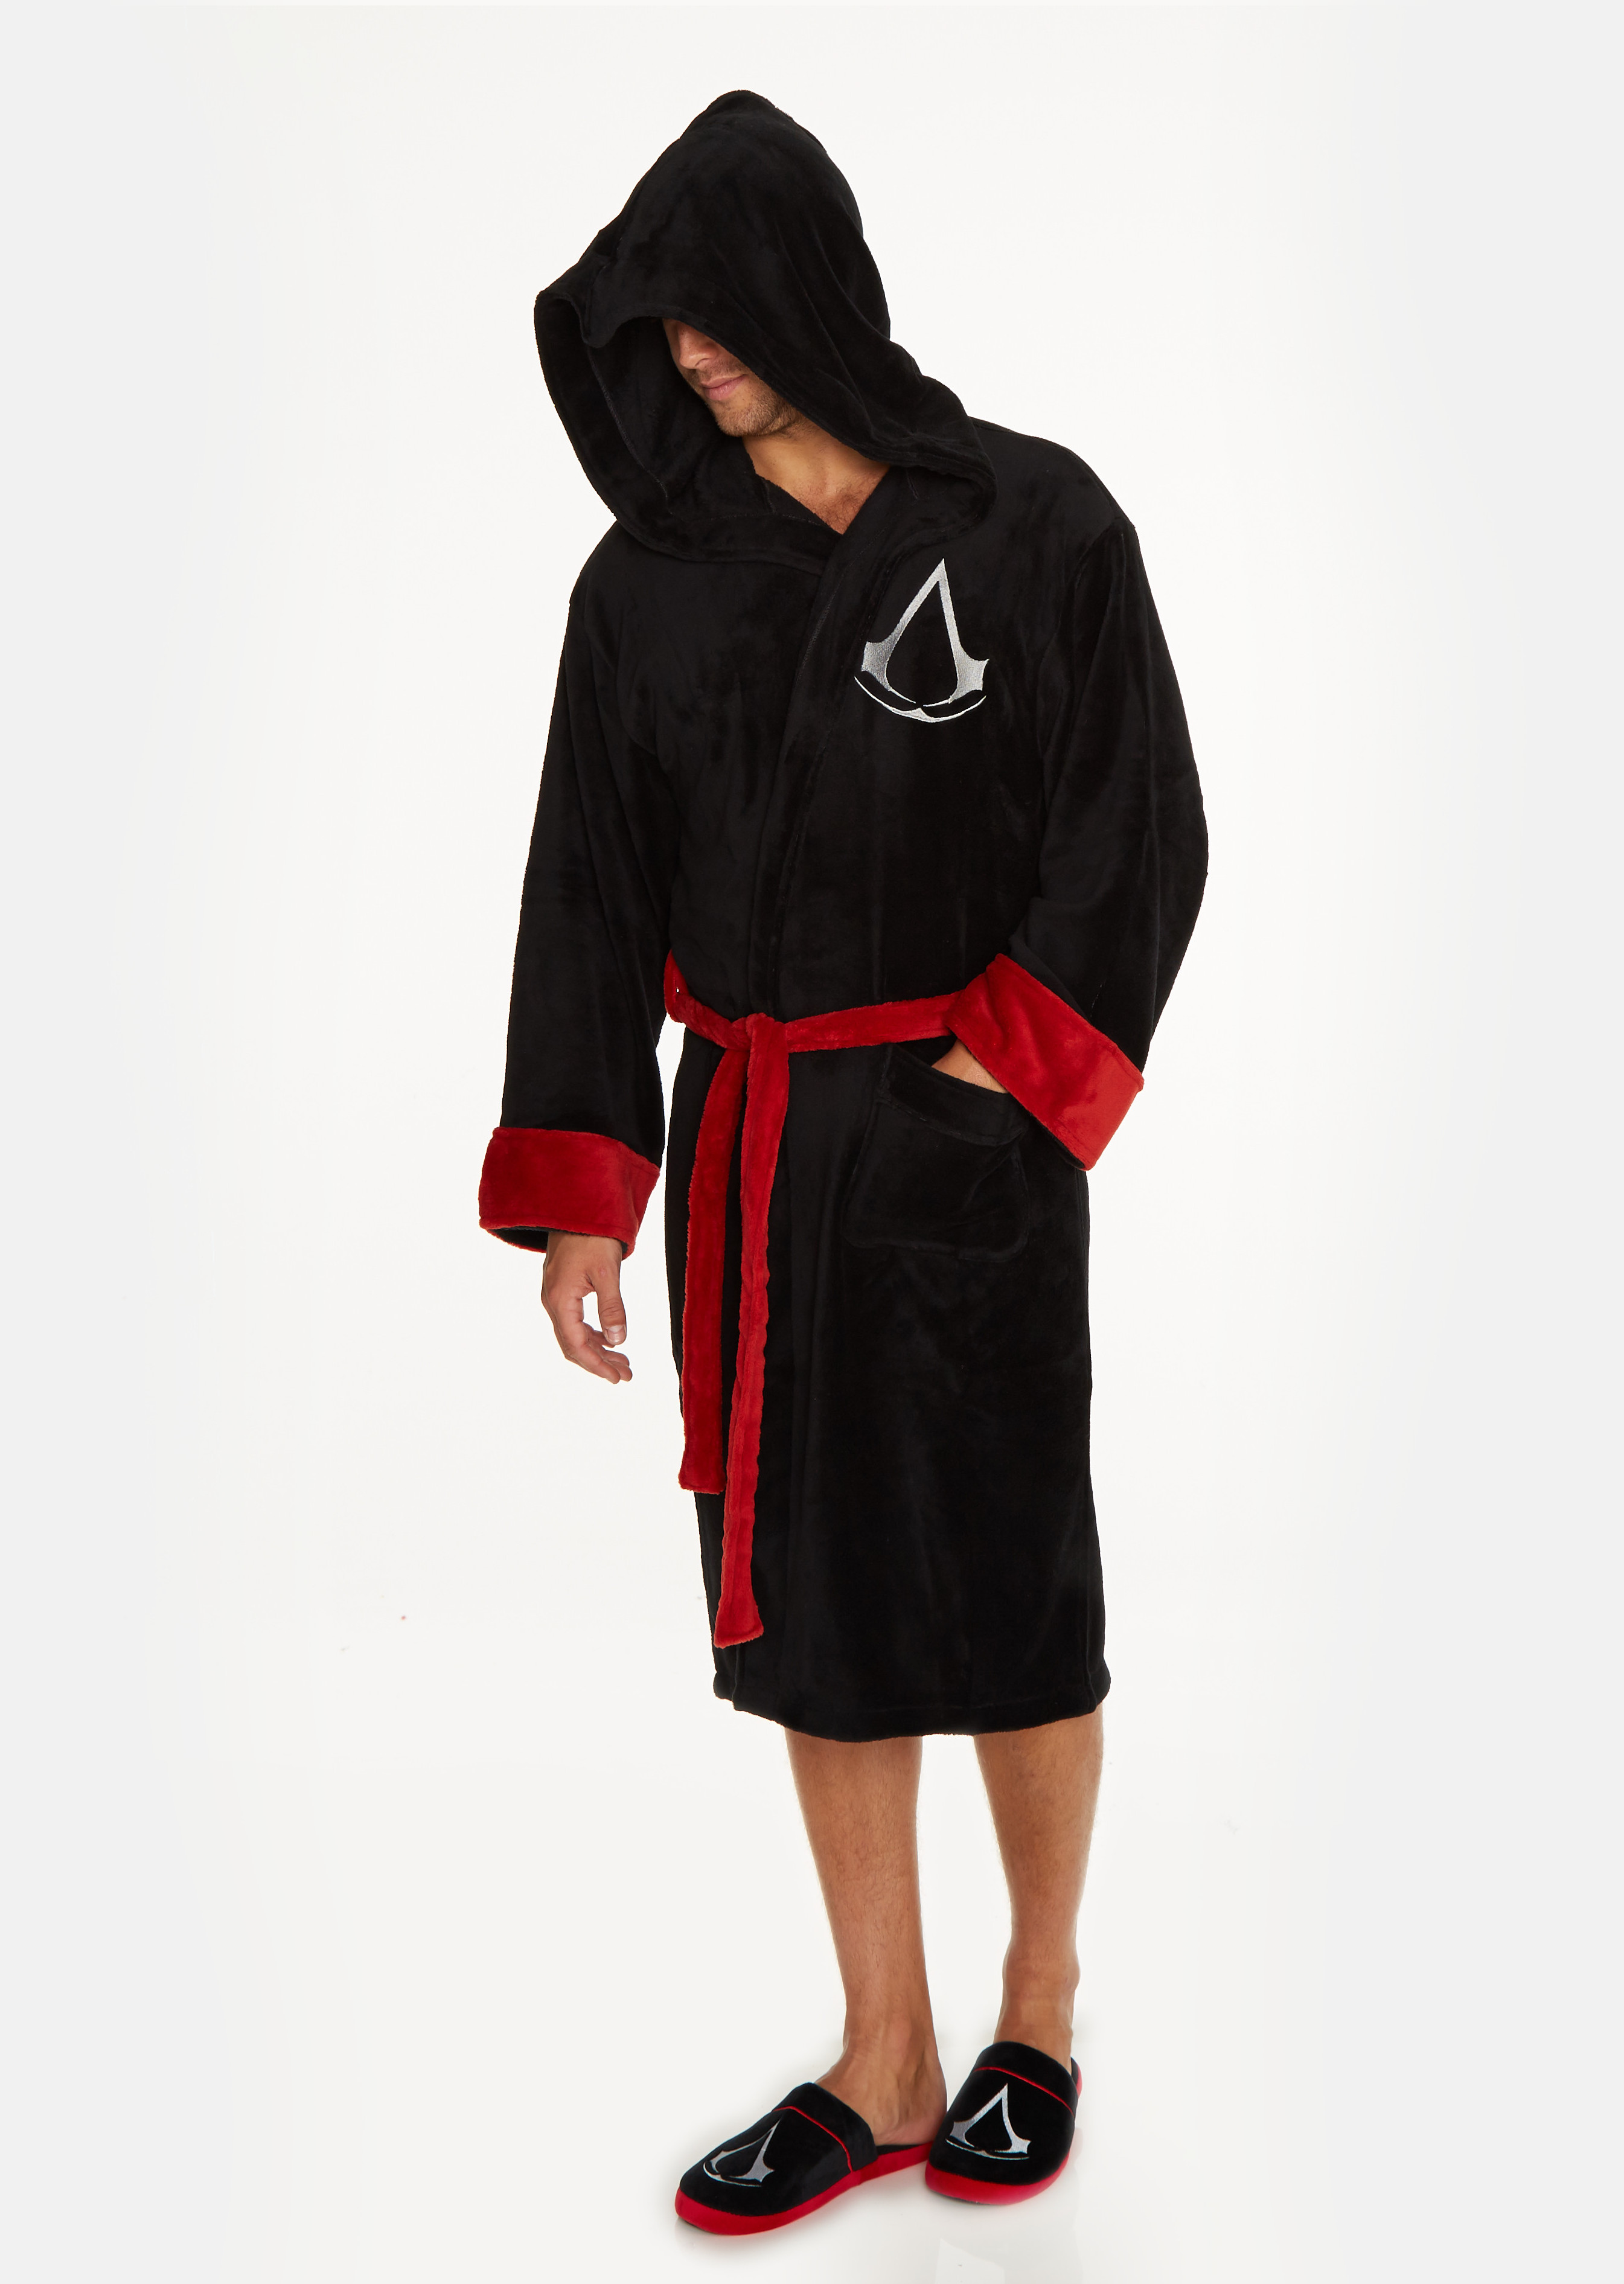 c58547d534 Assassin s Creed Assassin Black Adult Fleece Bathrobe – Groovy UK